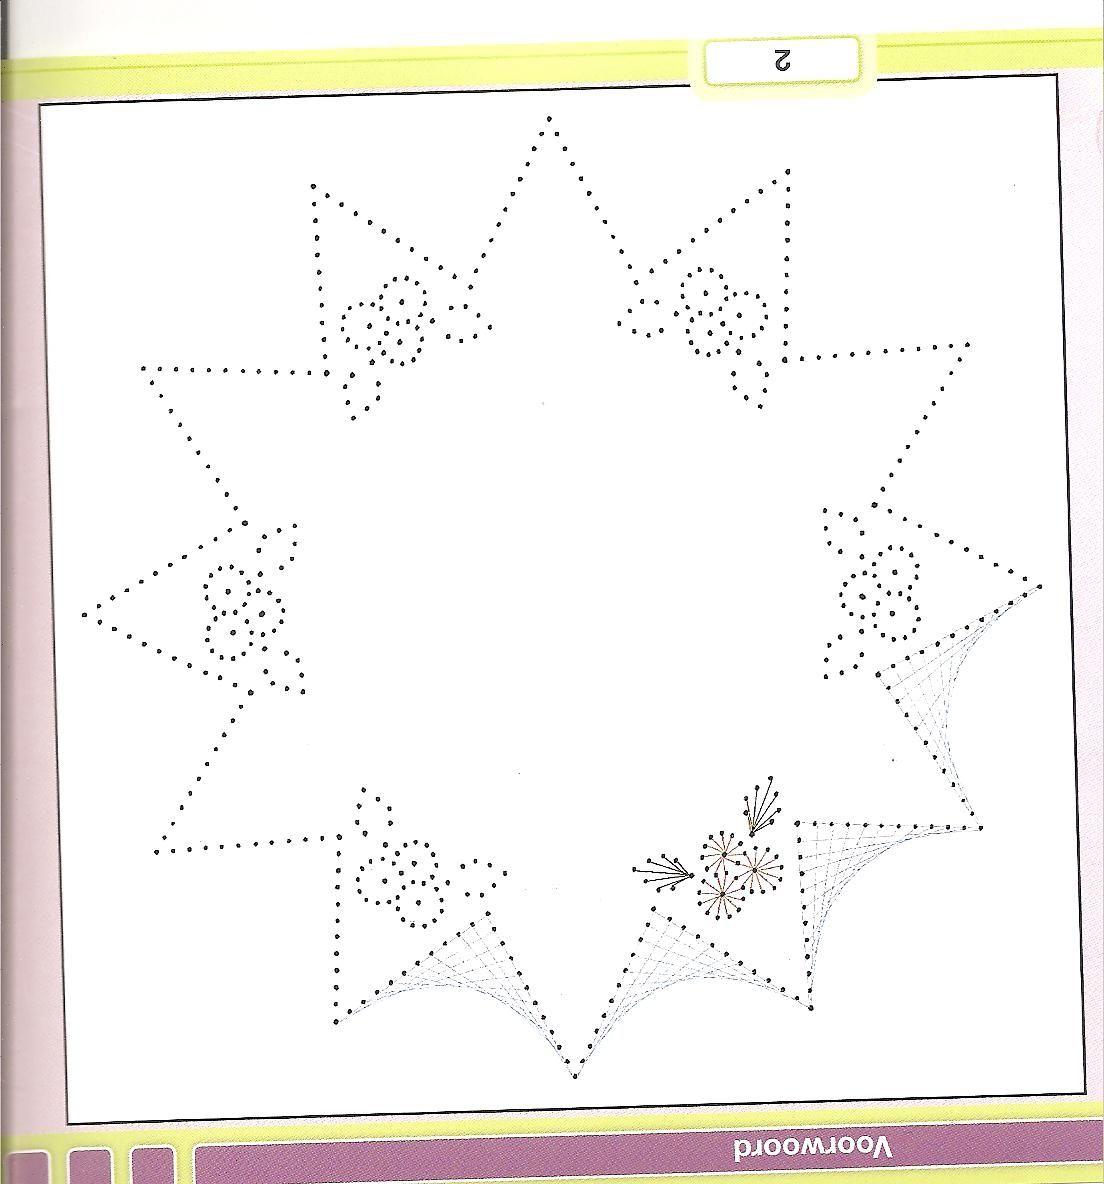 Pin de Adoreanu Kraiger Boglárka en fonalgrafika | Pinterest | Brujo ...